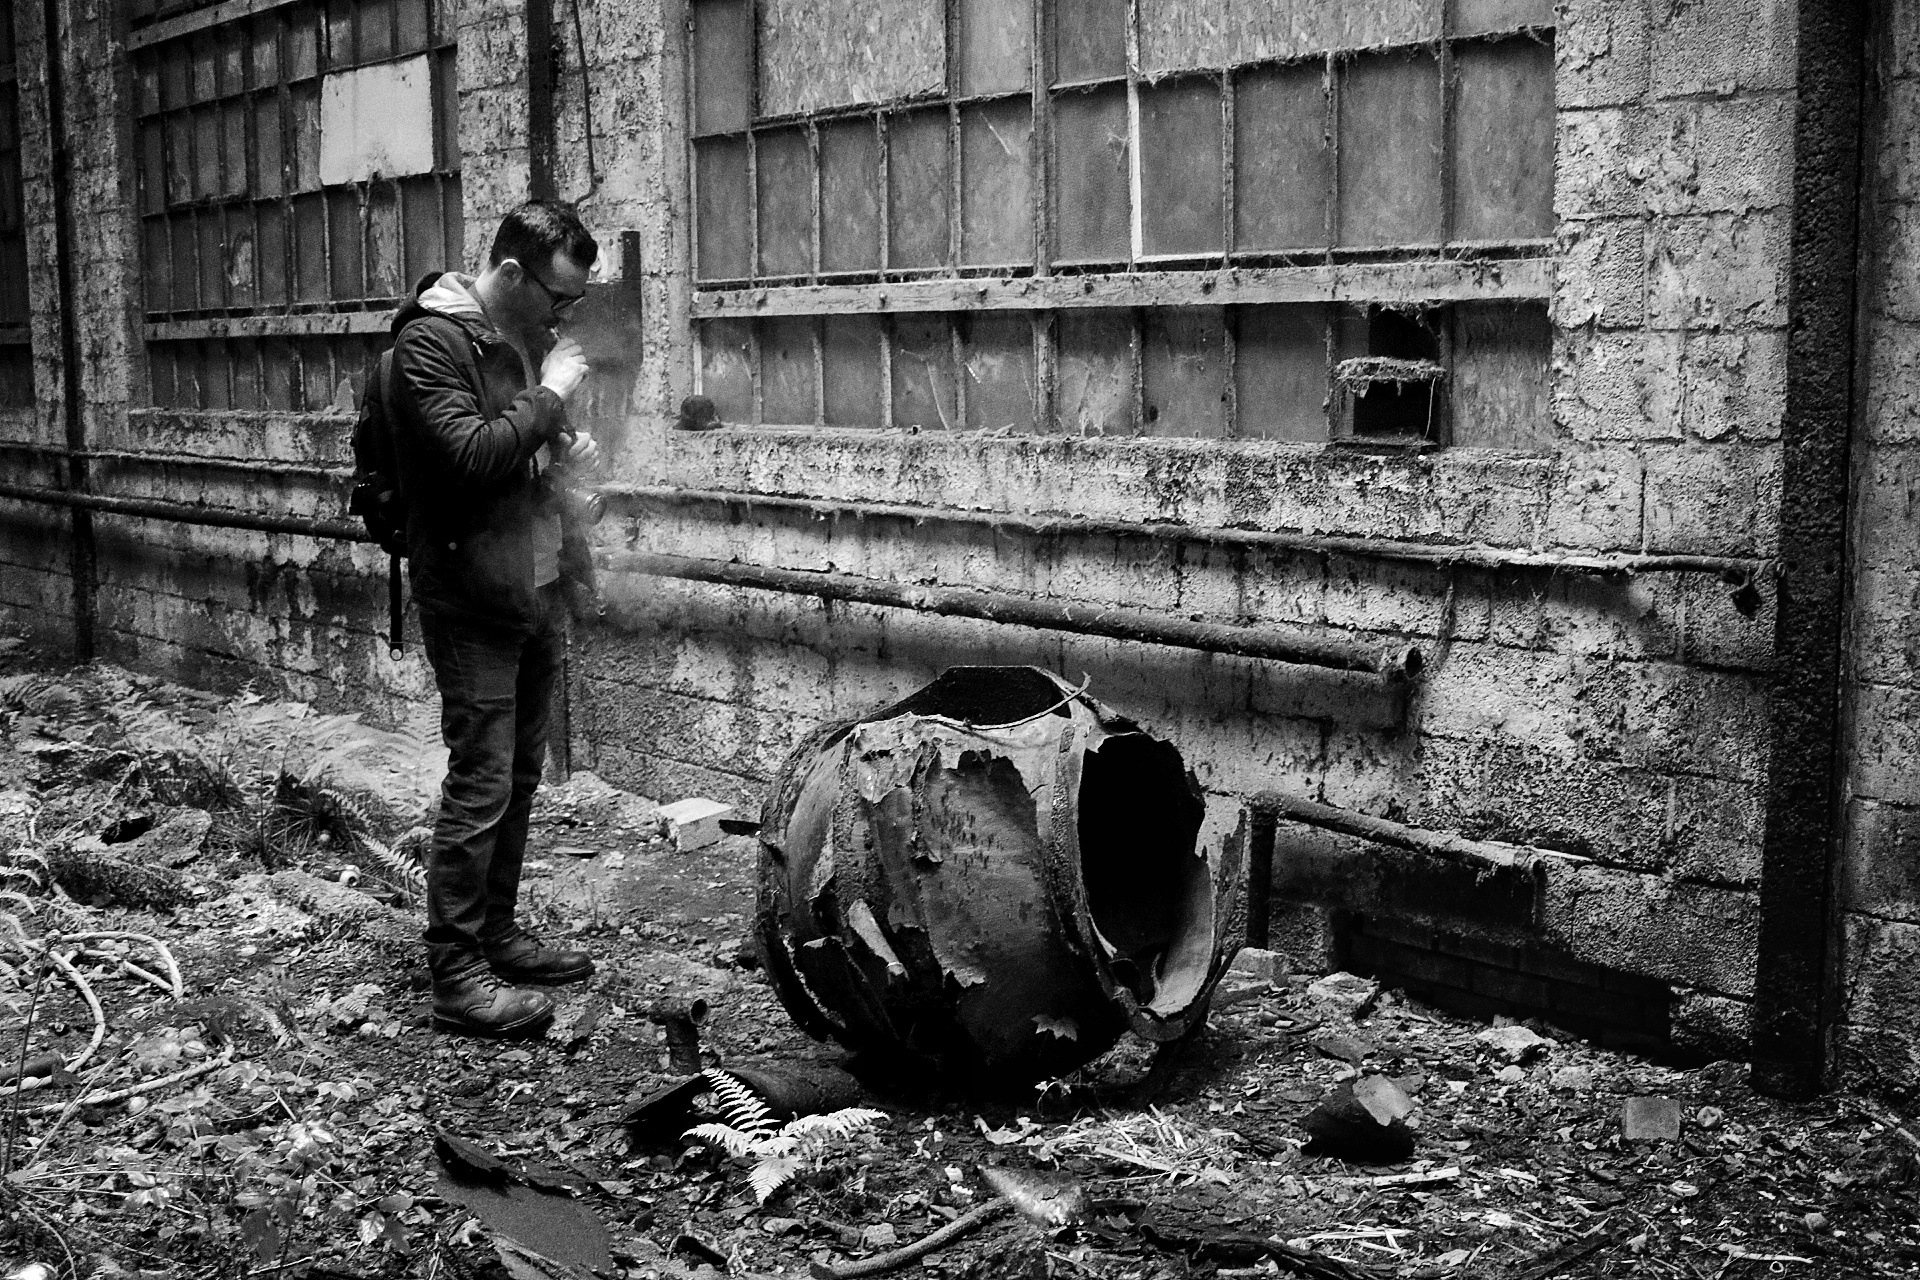 Sputnik by Broken_heritage